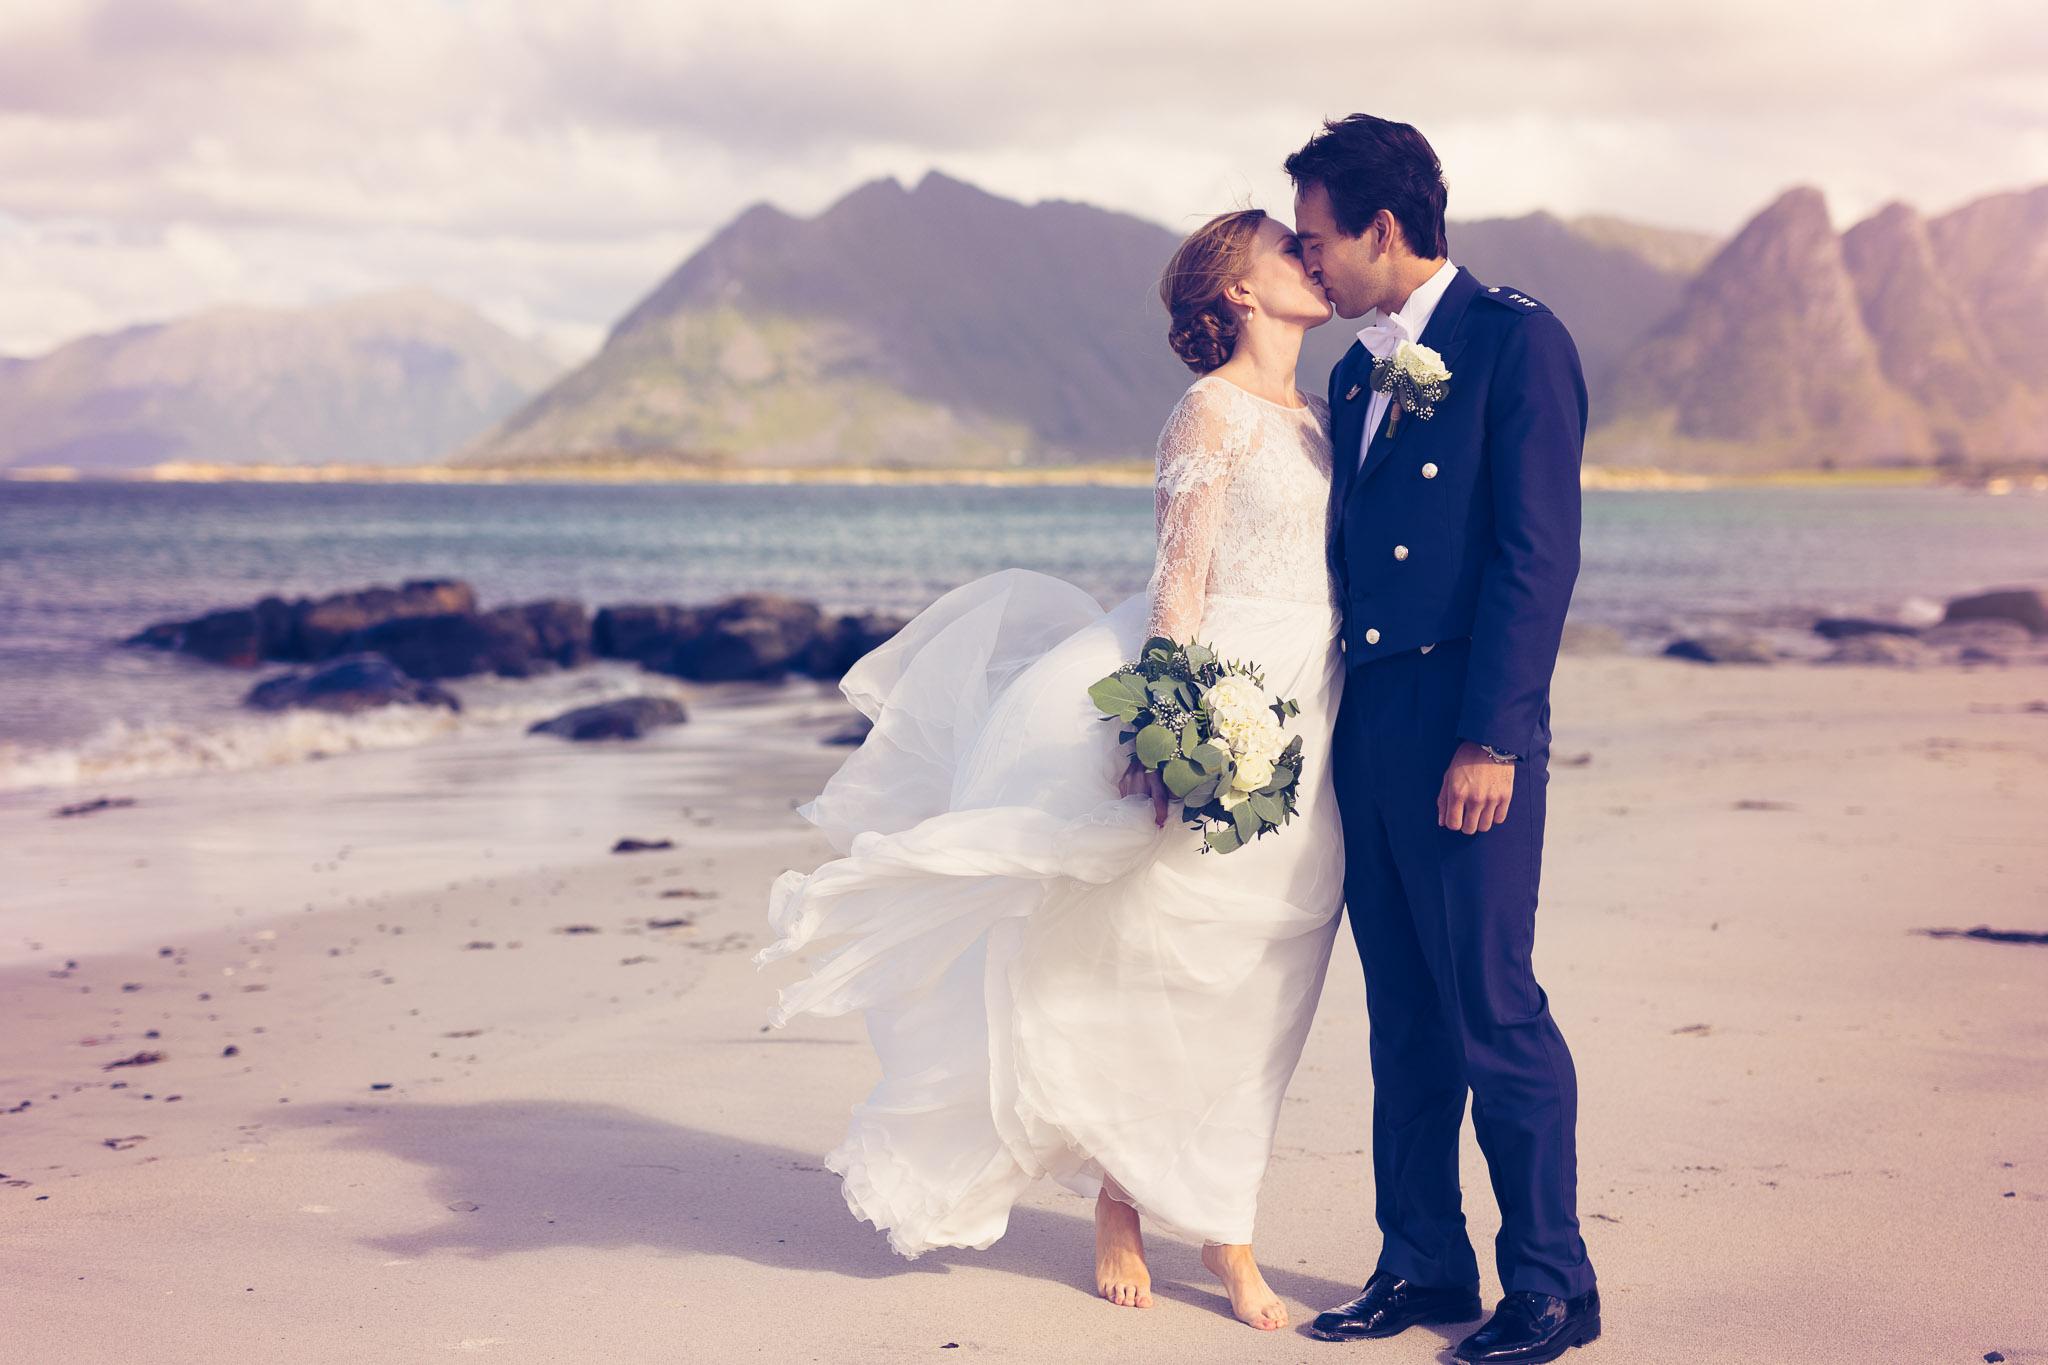 Bryllupsfotografering-lofoten-heldags-fjell-25